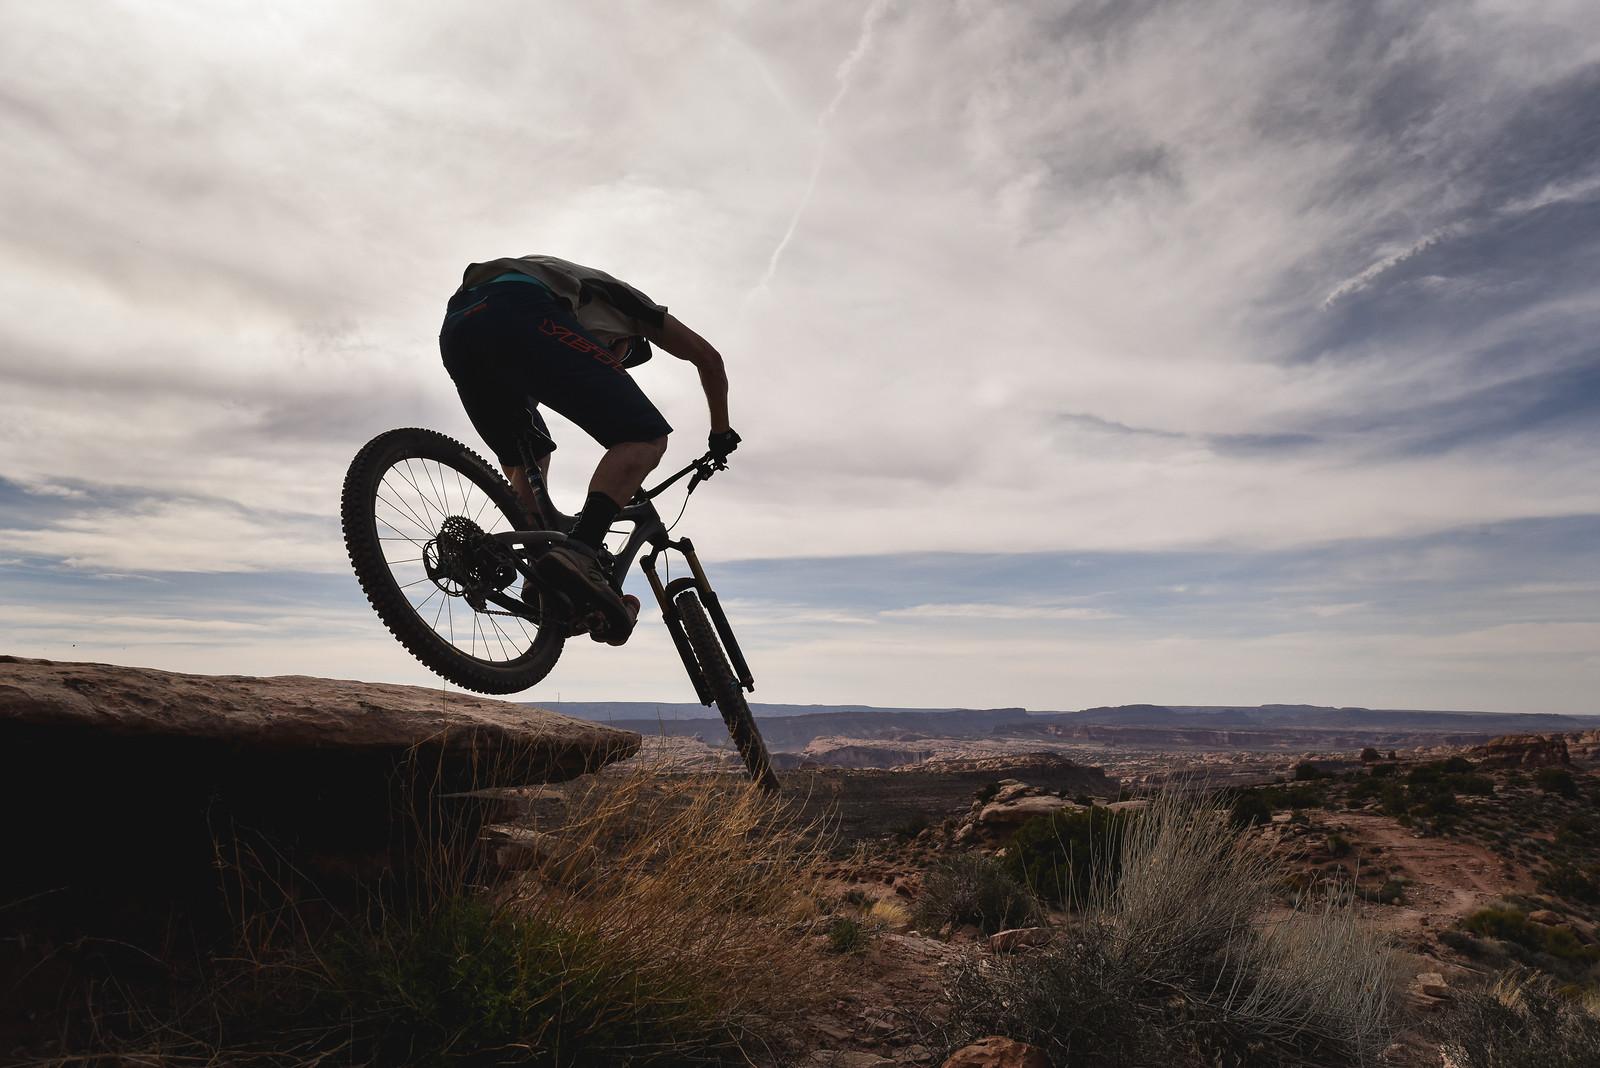 PJR 0989-1-2 - russellpj - Mountain Biking Pictures - Vital MTB